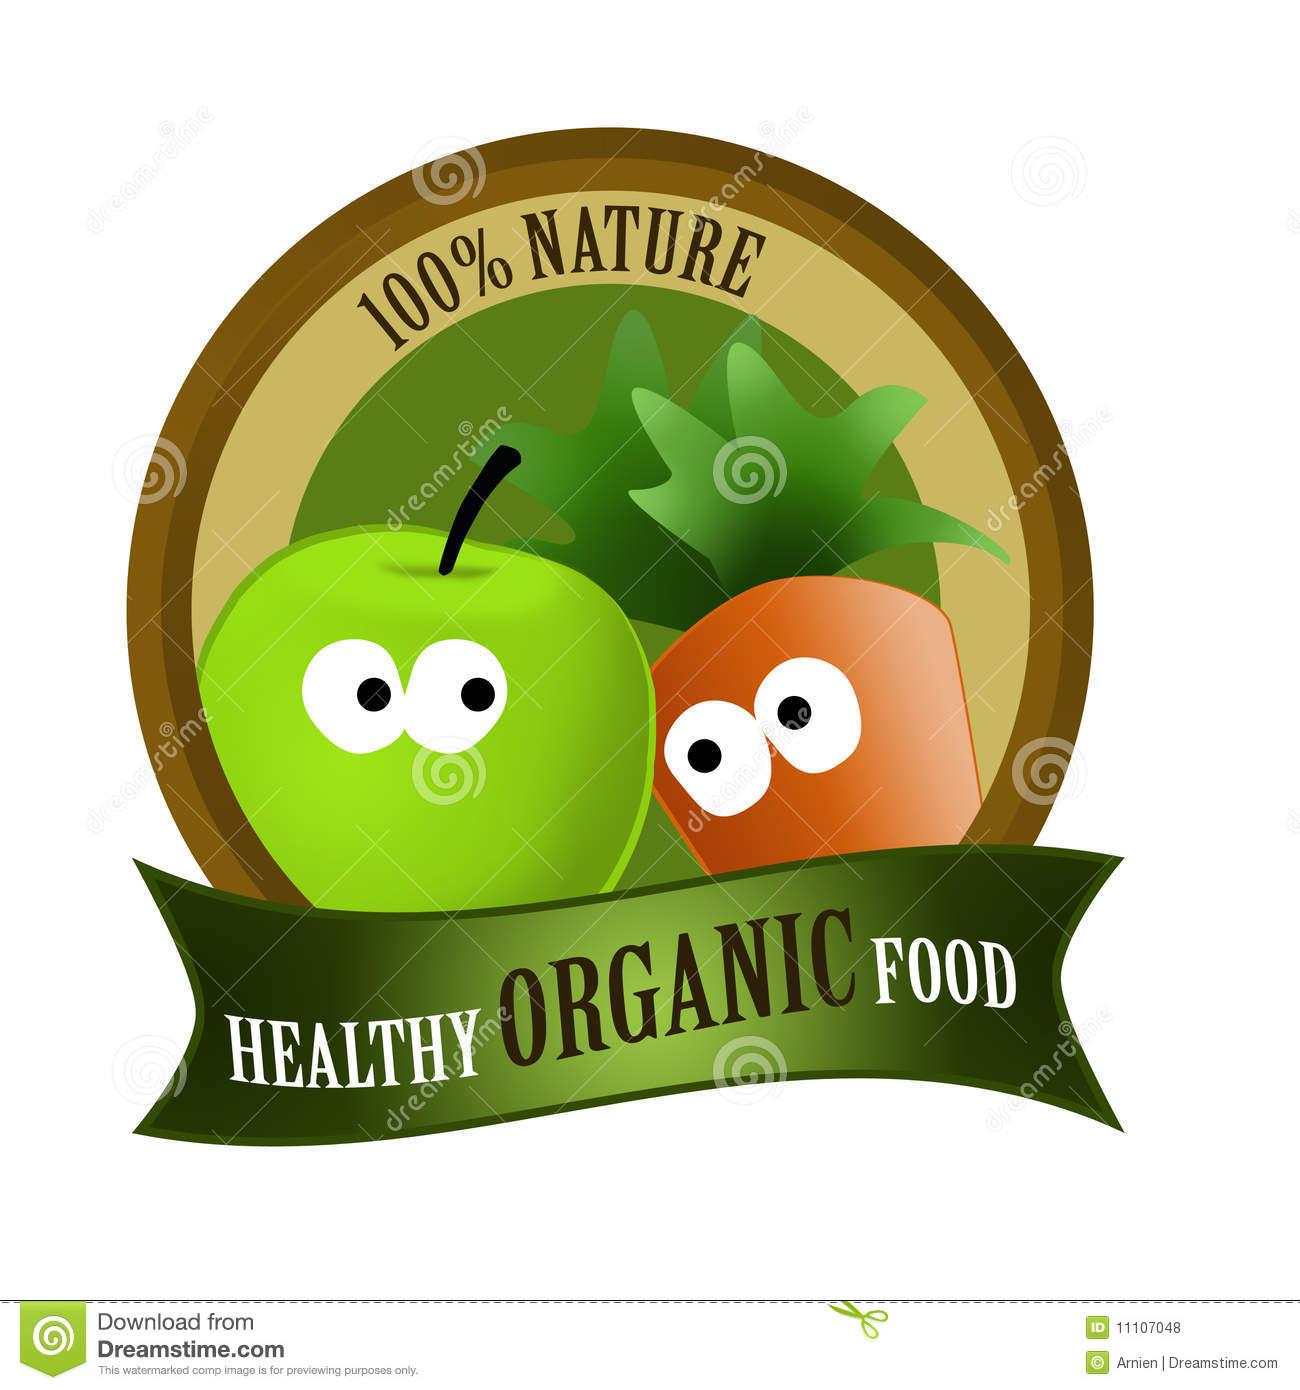 Organic Food Healthy Royalty Free Stock Photos.